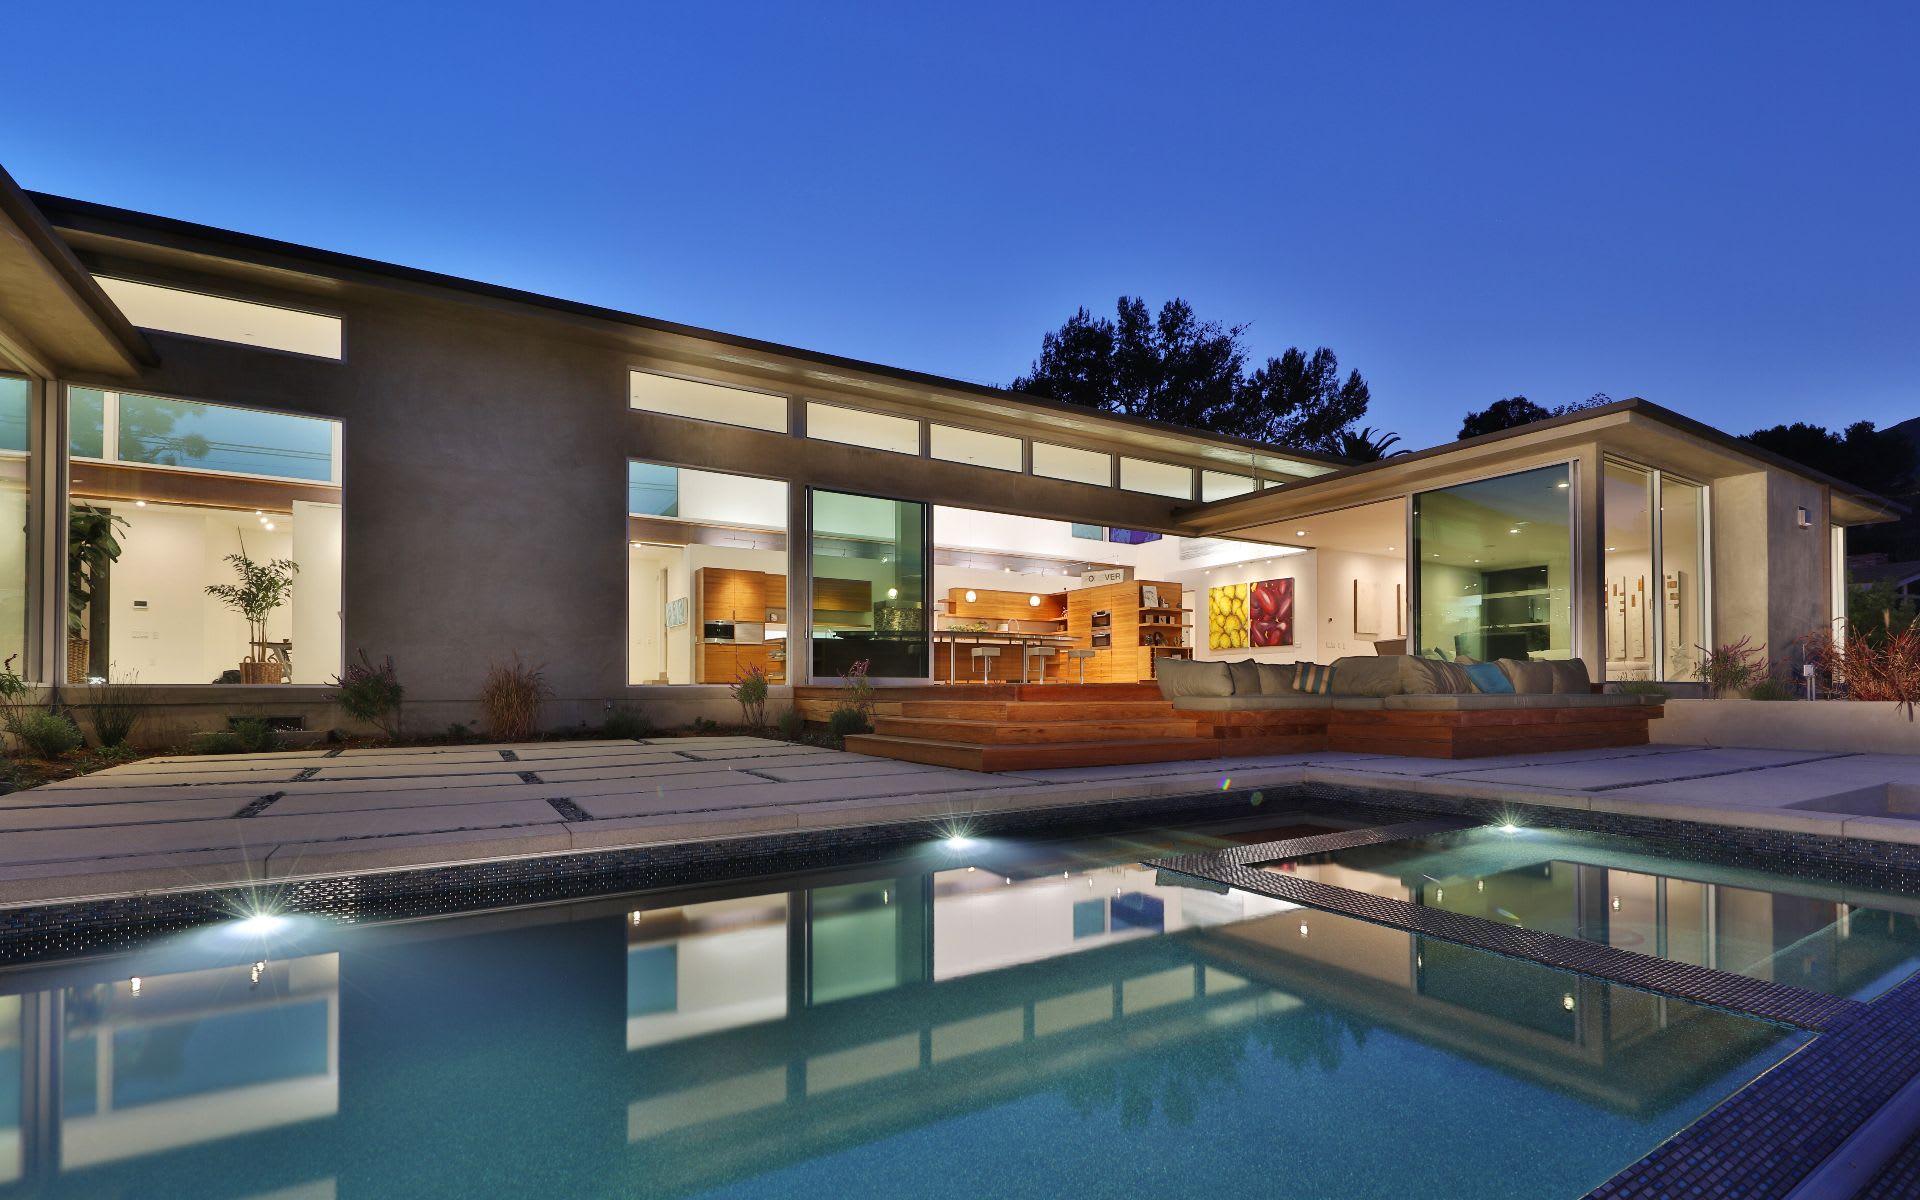 Single Family Home for Sale at 5664 Calpine Dr 5664 Calpine Dr Malibu, California,90265 United States